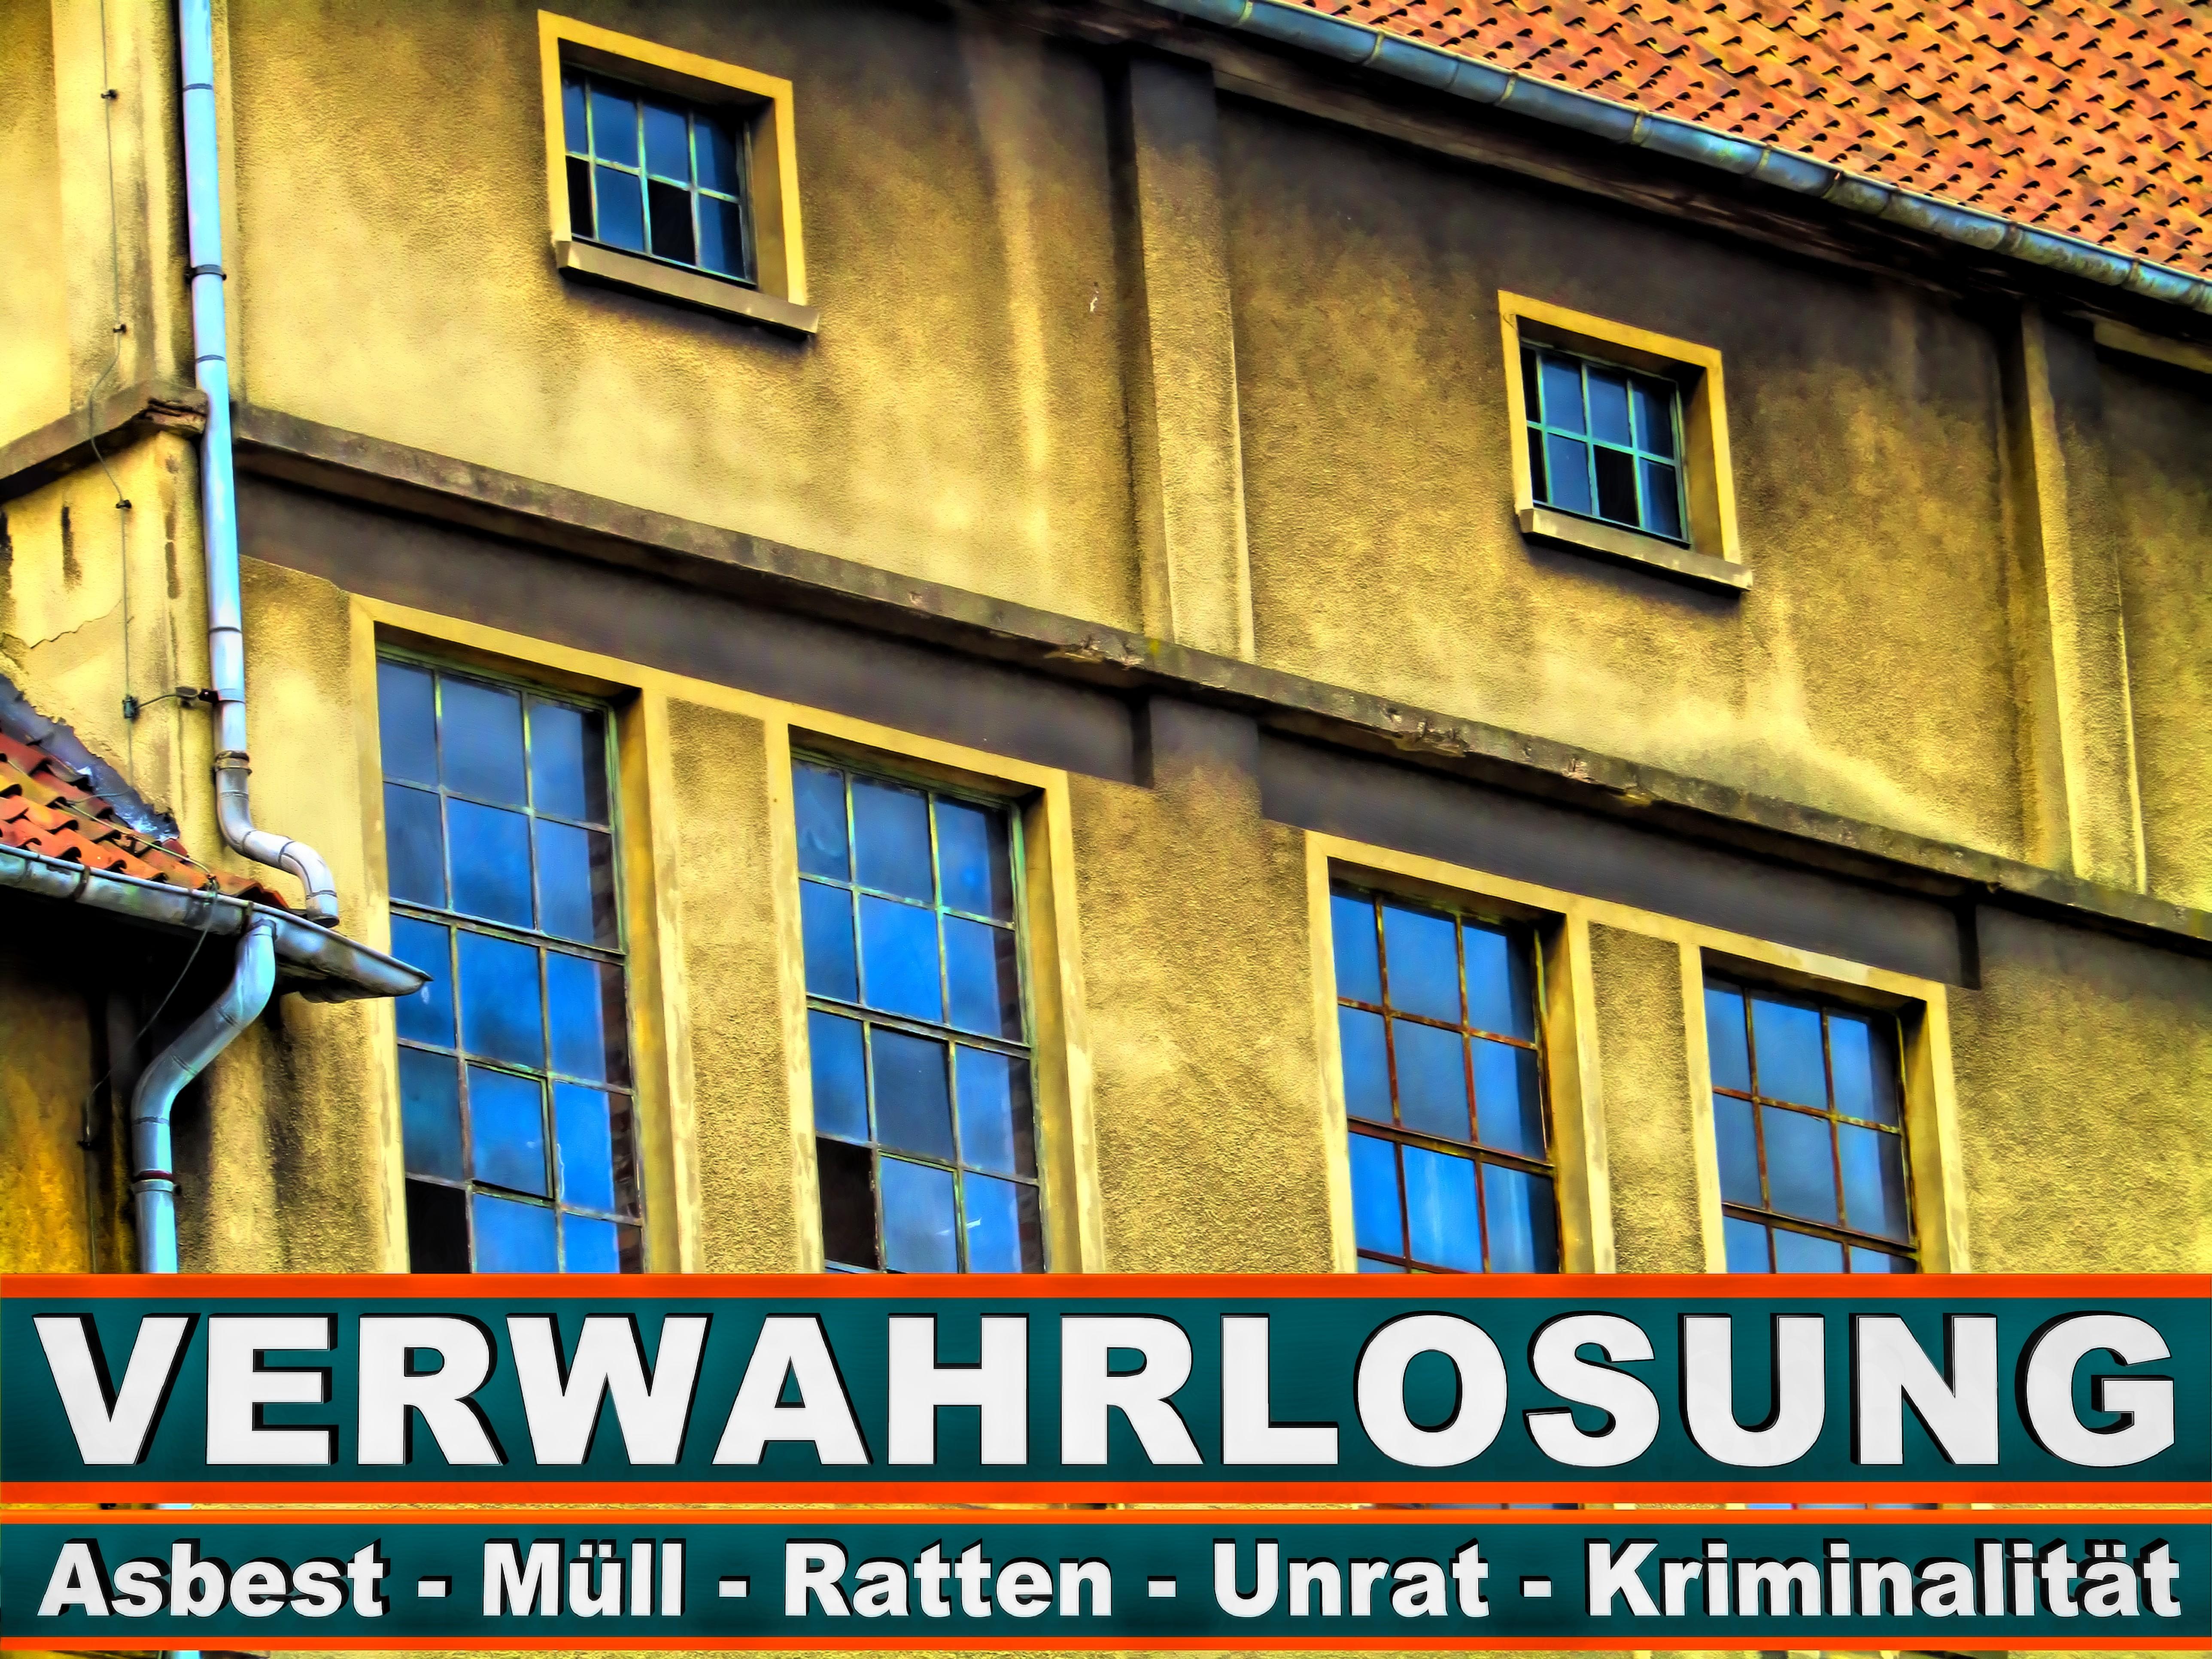 Öko Tech Park Bielefeld MVJ METALLVERARBEITUNG Jaroslaus Jankowski Krackser Str 12 030